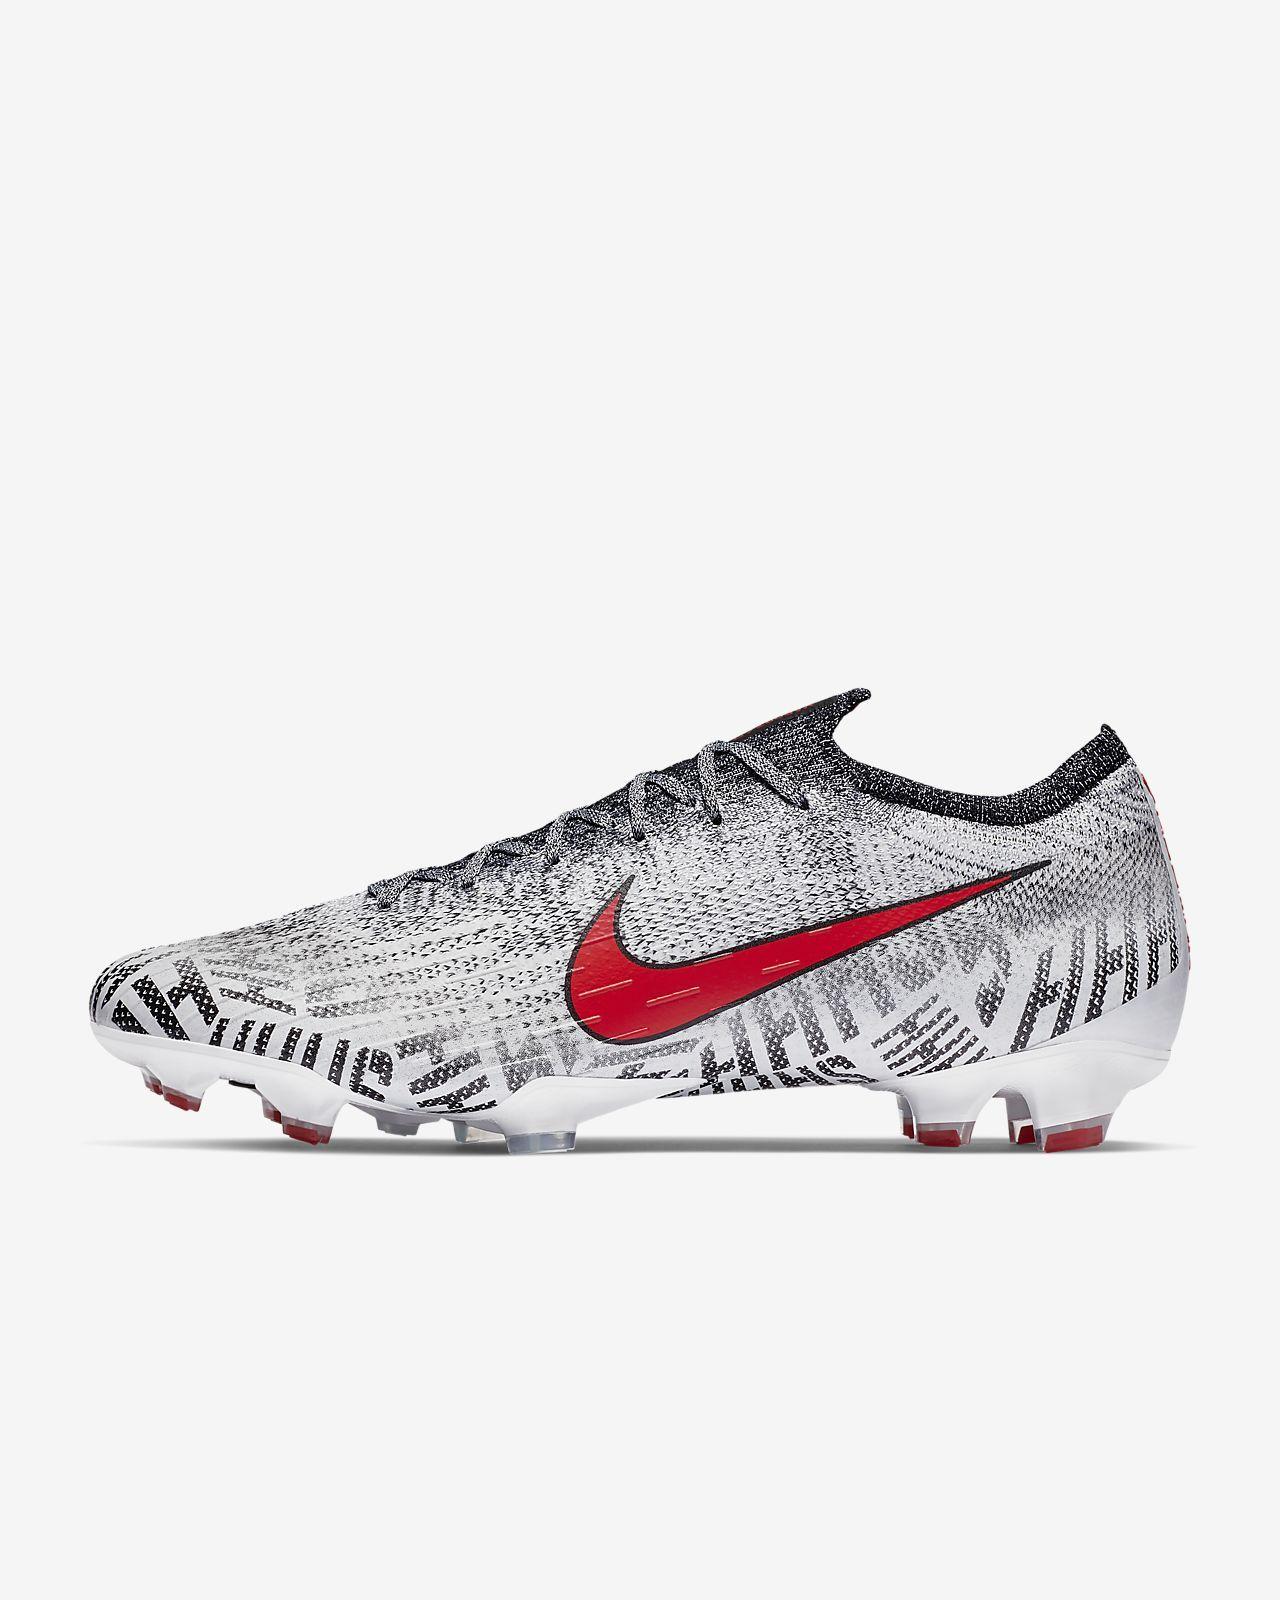 dc6f51d49 Chuteiras de futebol para terreno firme Nike Mercurial Vapor 360 Elite  Neymar Jr